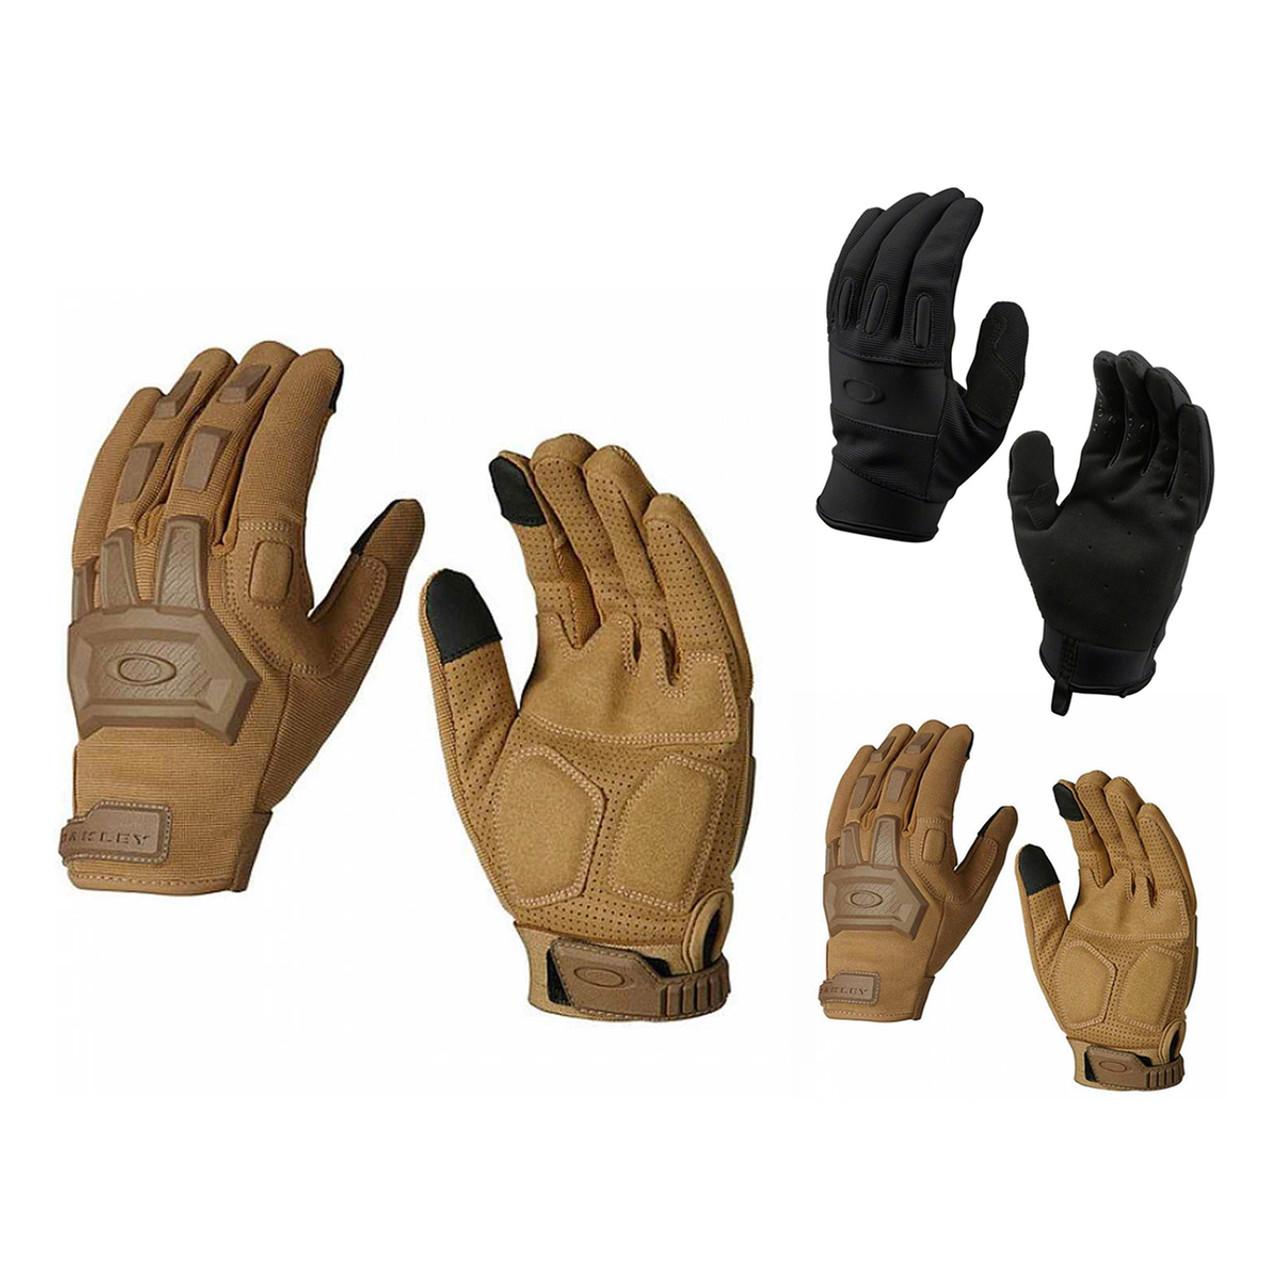 16b7a7c2c56 Oakley Flexion Gloves